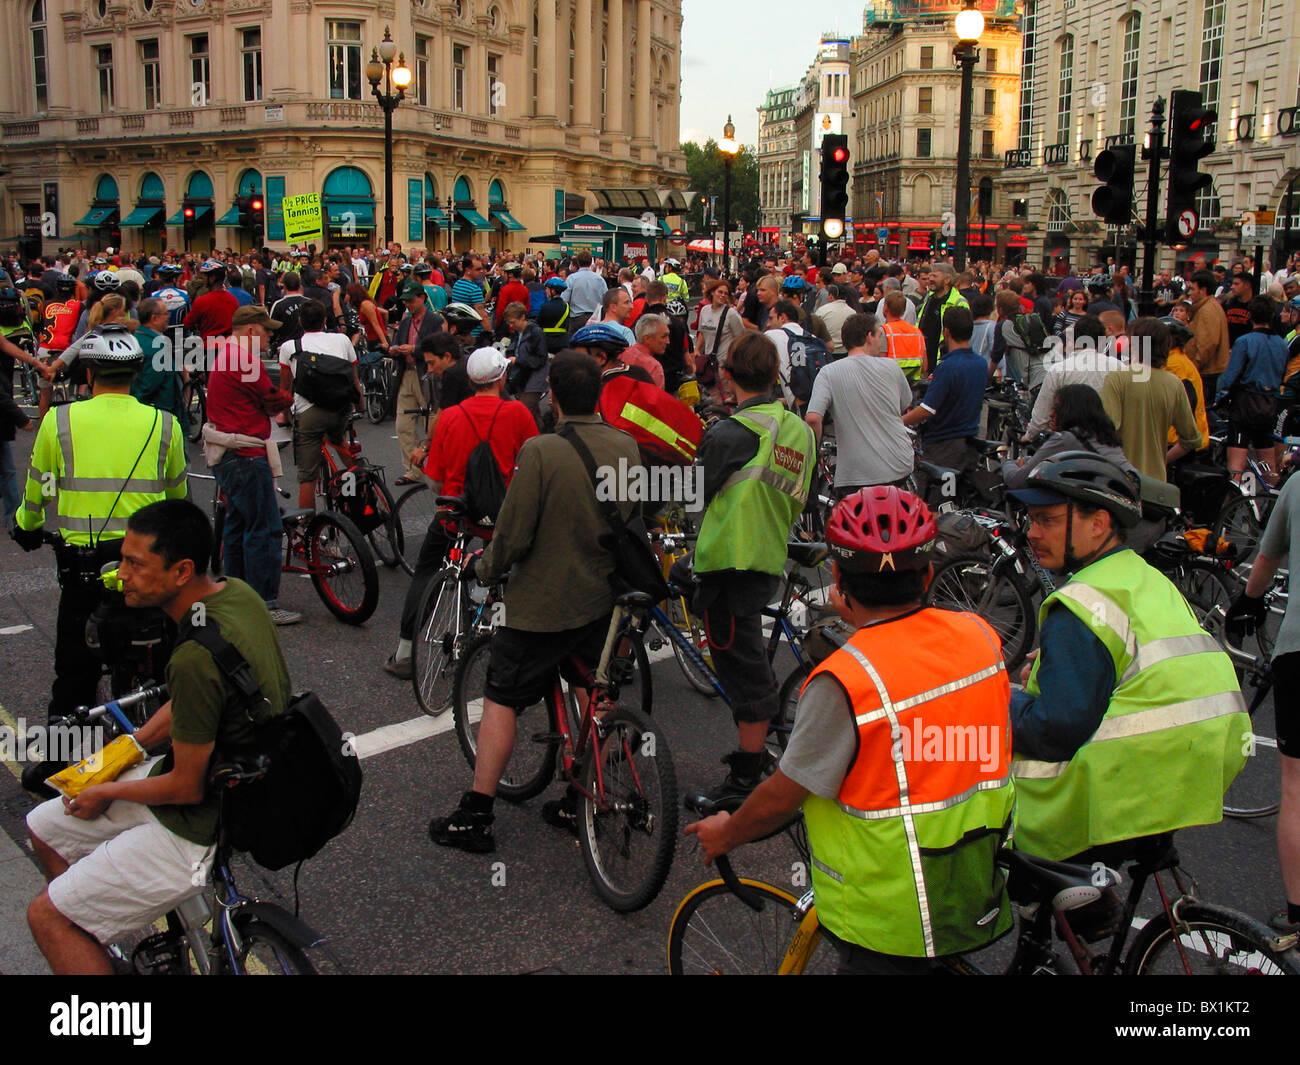 Démonstration Démonstration demo location location bike rally rue trafic town city Londres Grande Bretagne Photo Stock